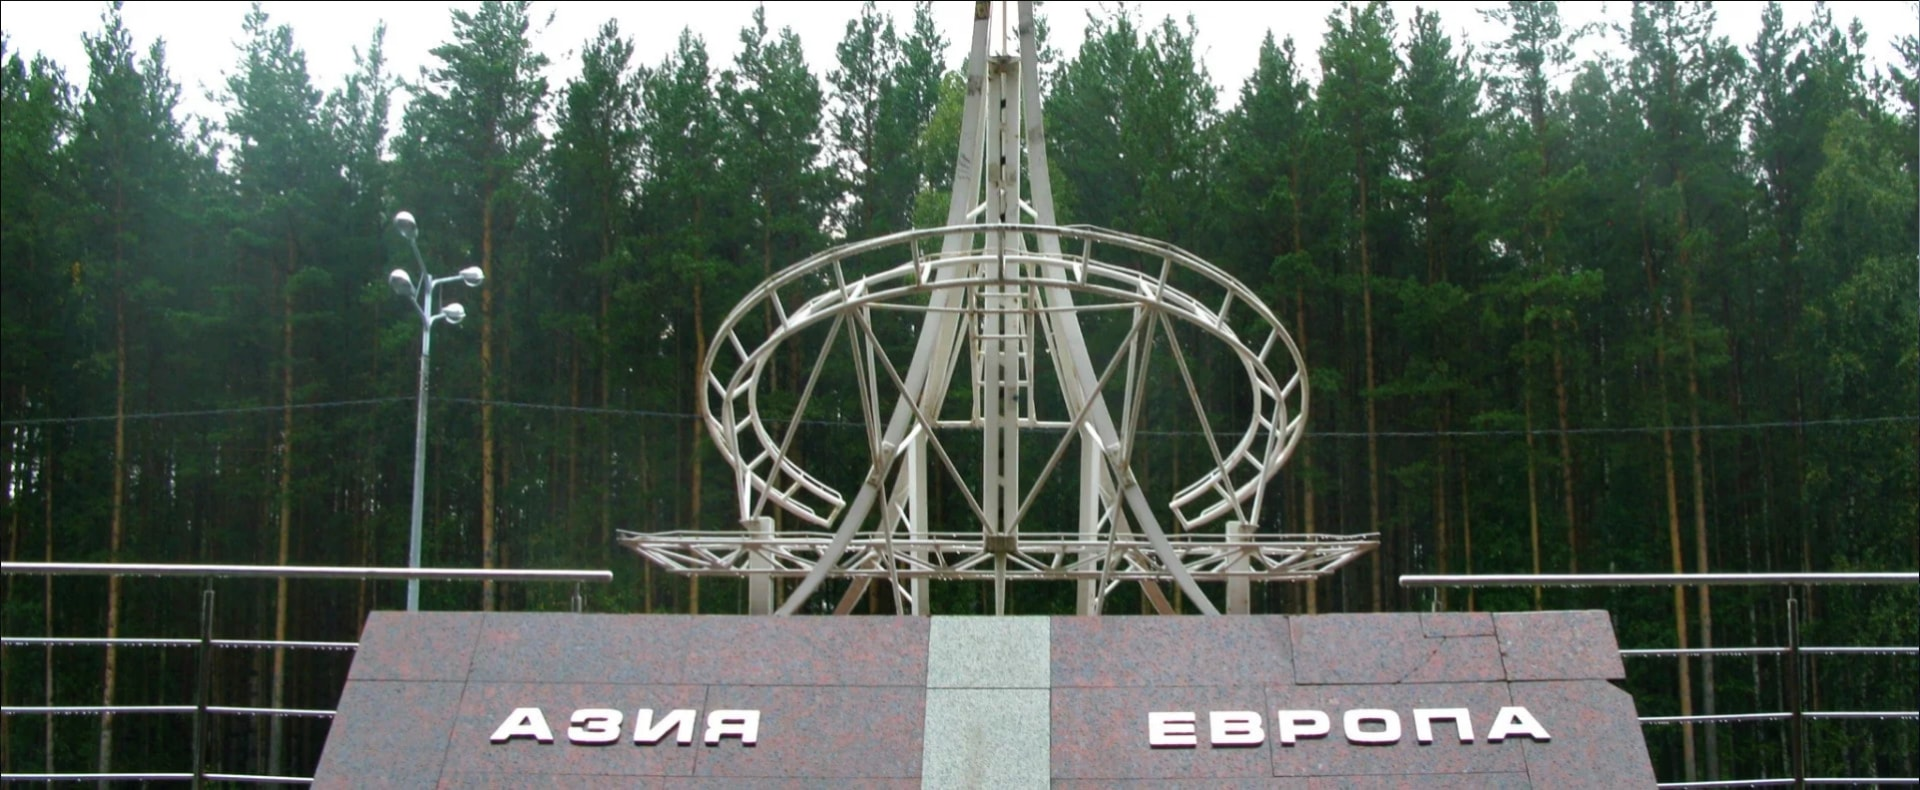 Europe - Asia Obelisk, Ekaterinburg